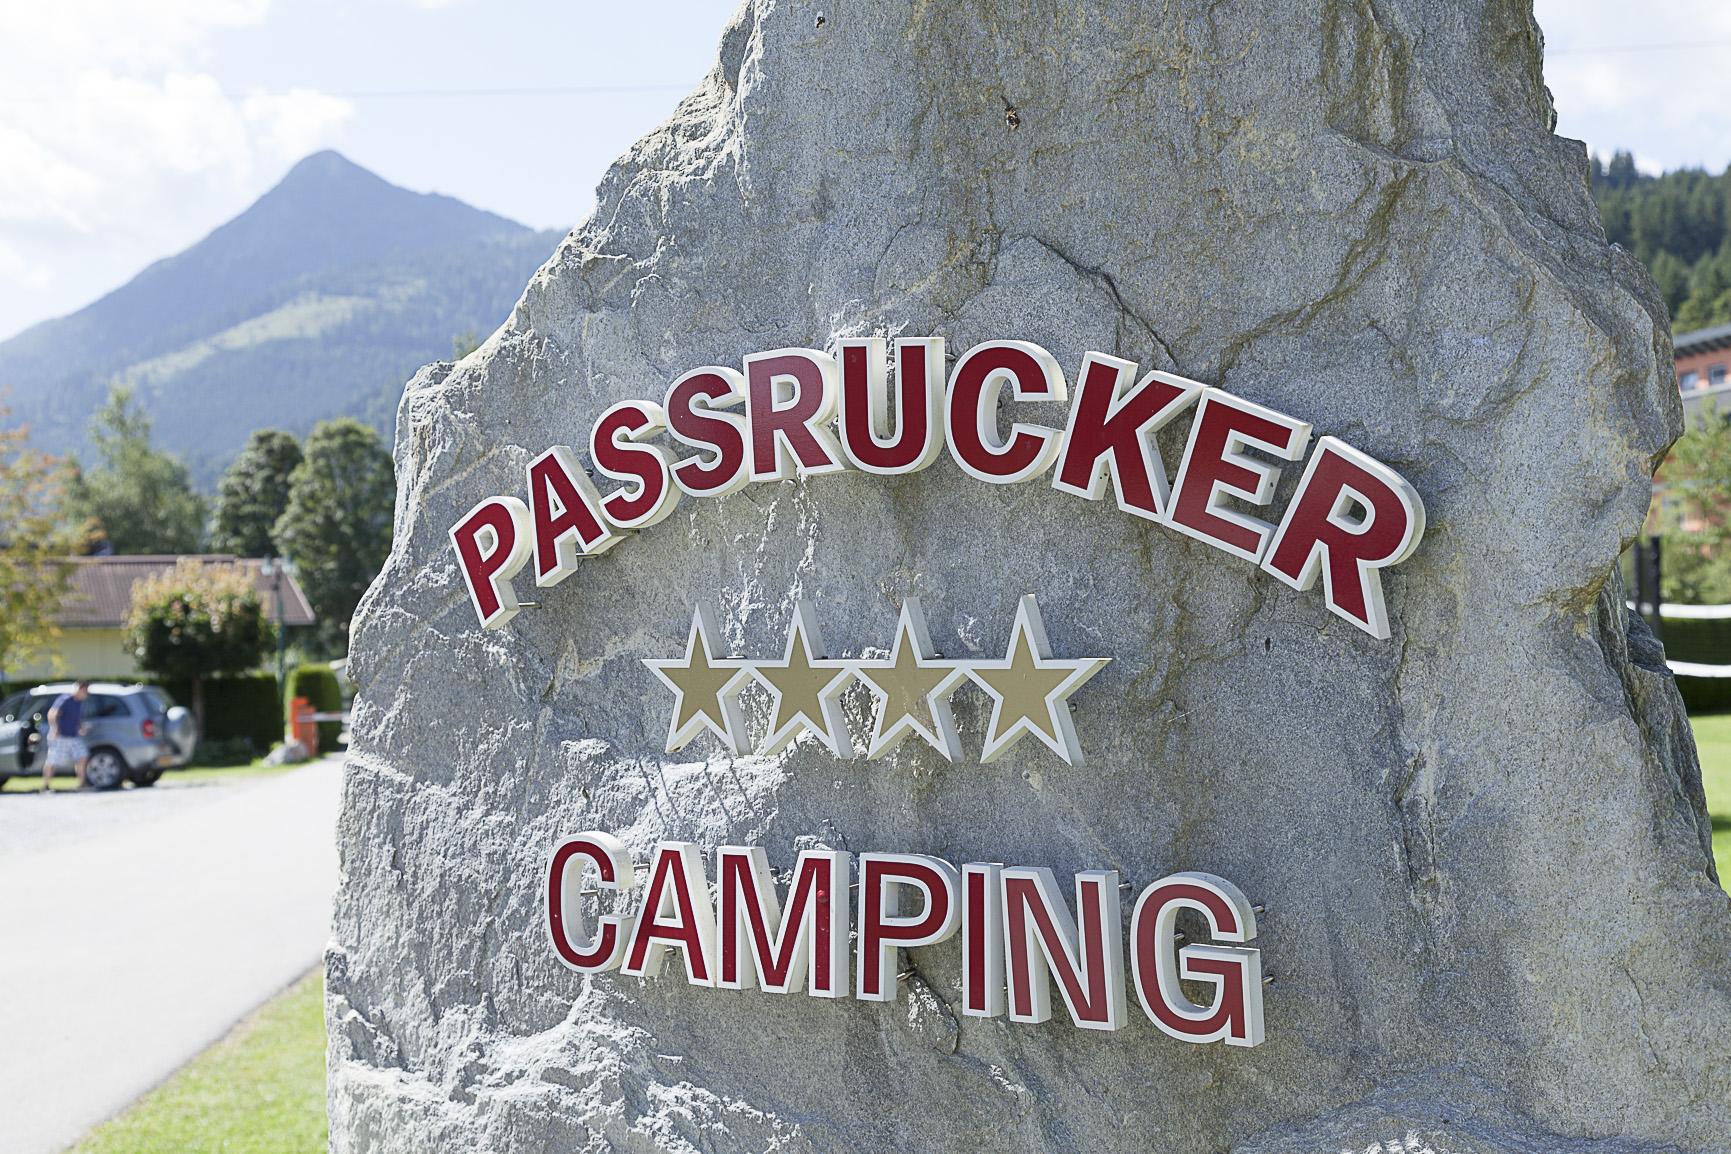 Willkommen am Campingplatz